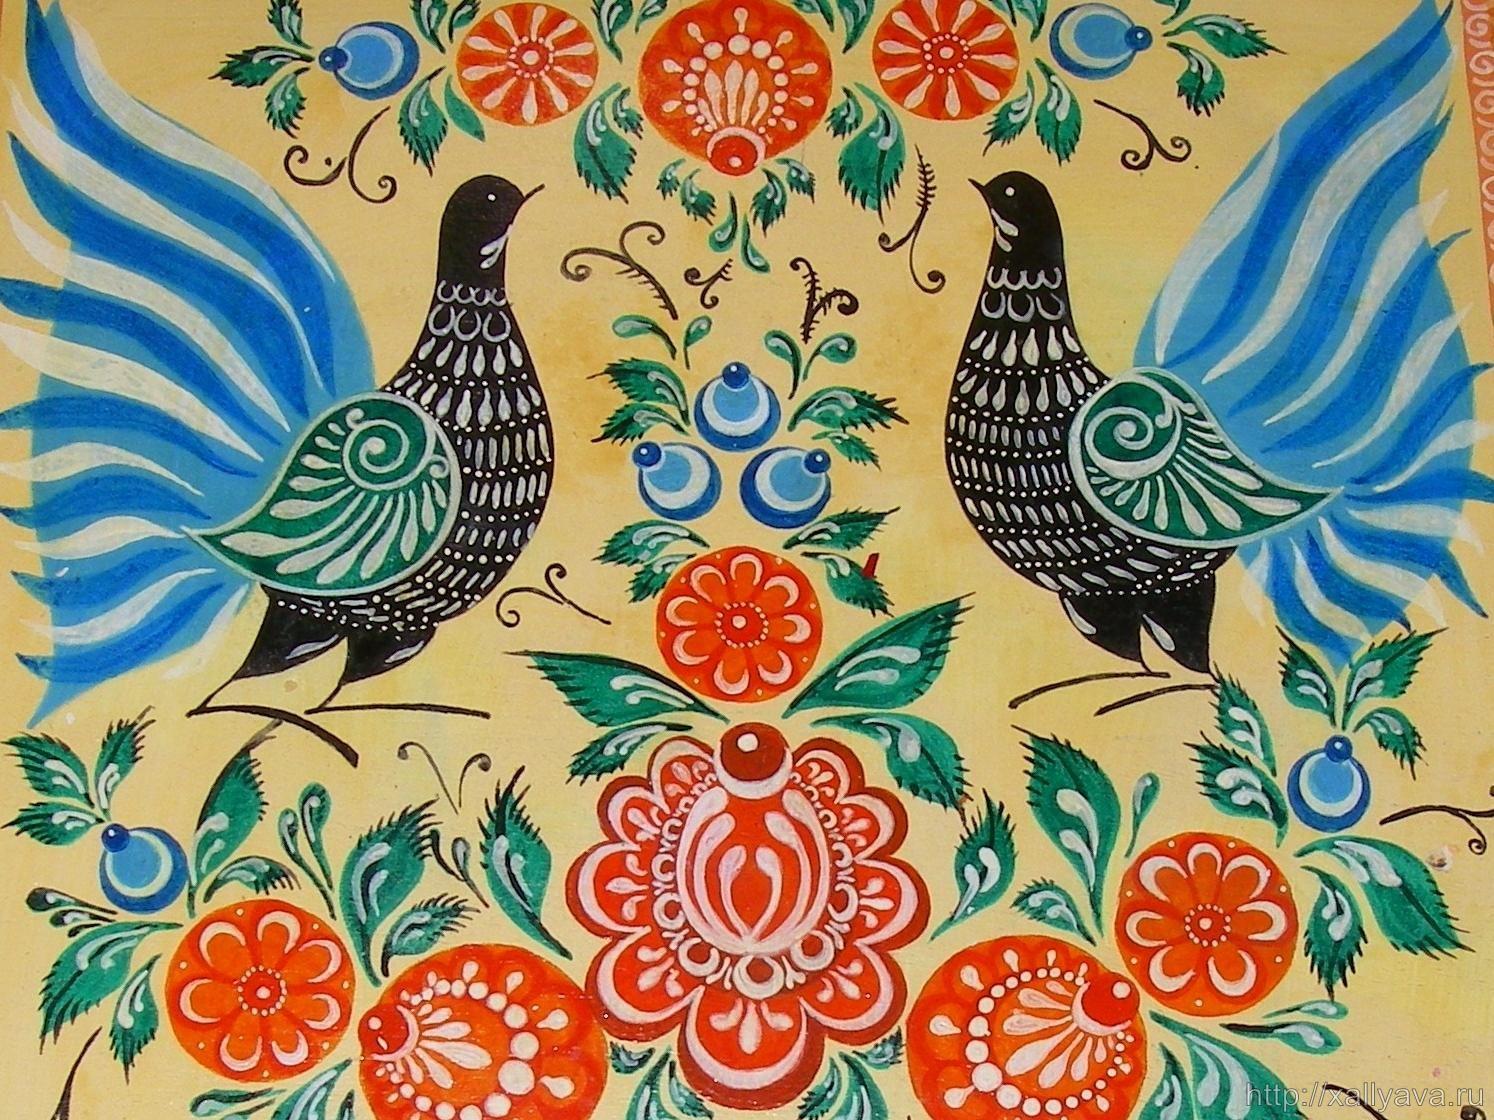 наши декоративно-прикладное искусство картинки по изо давно разобрали